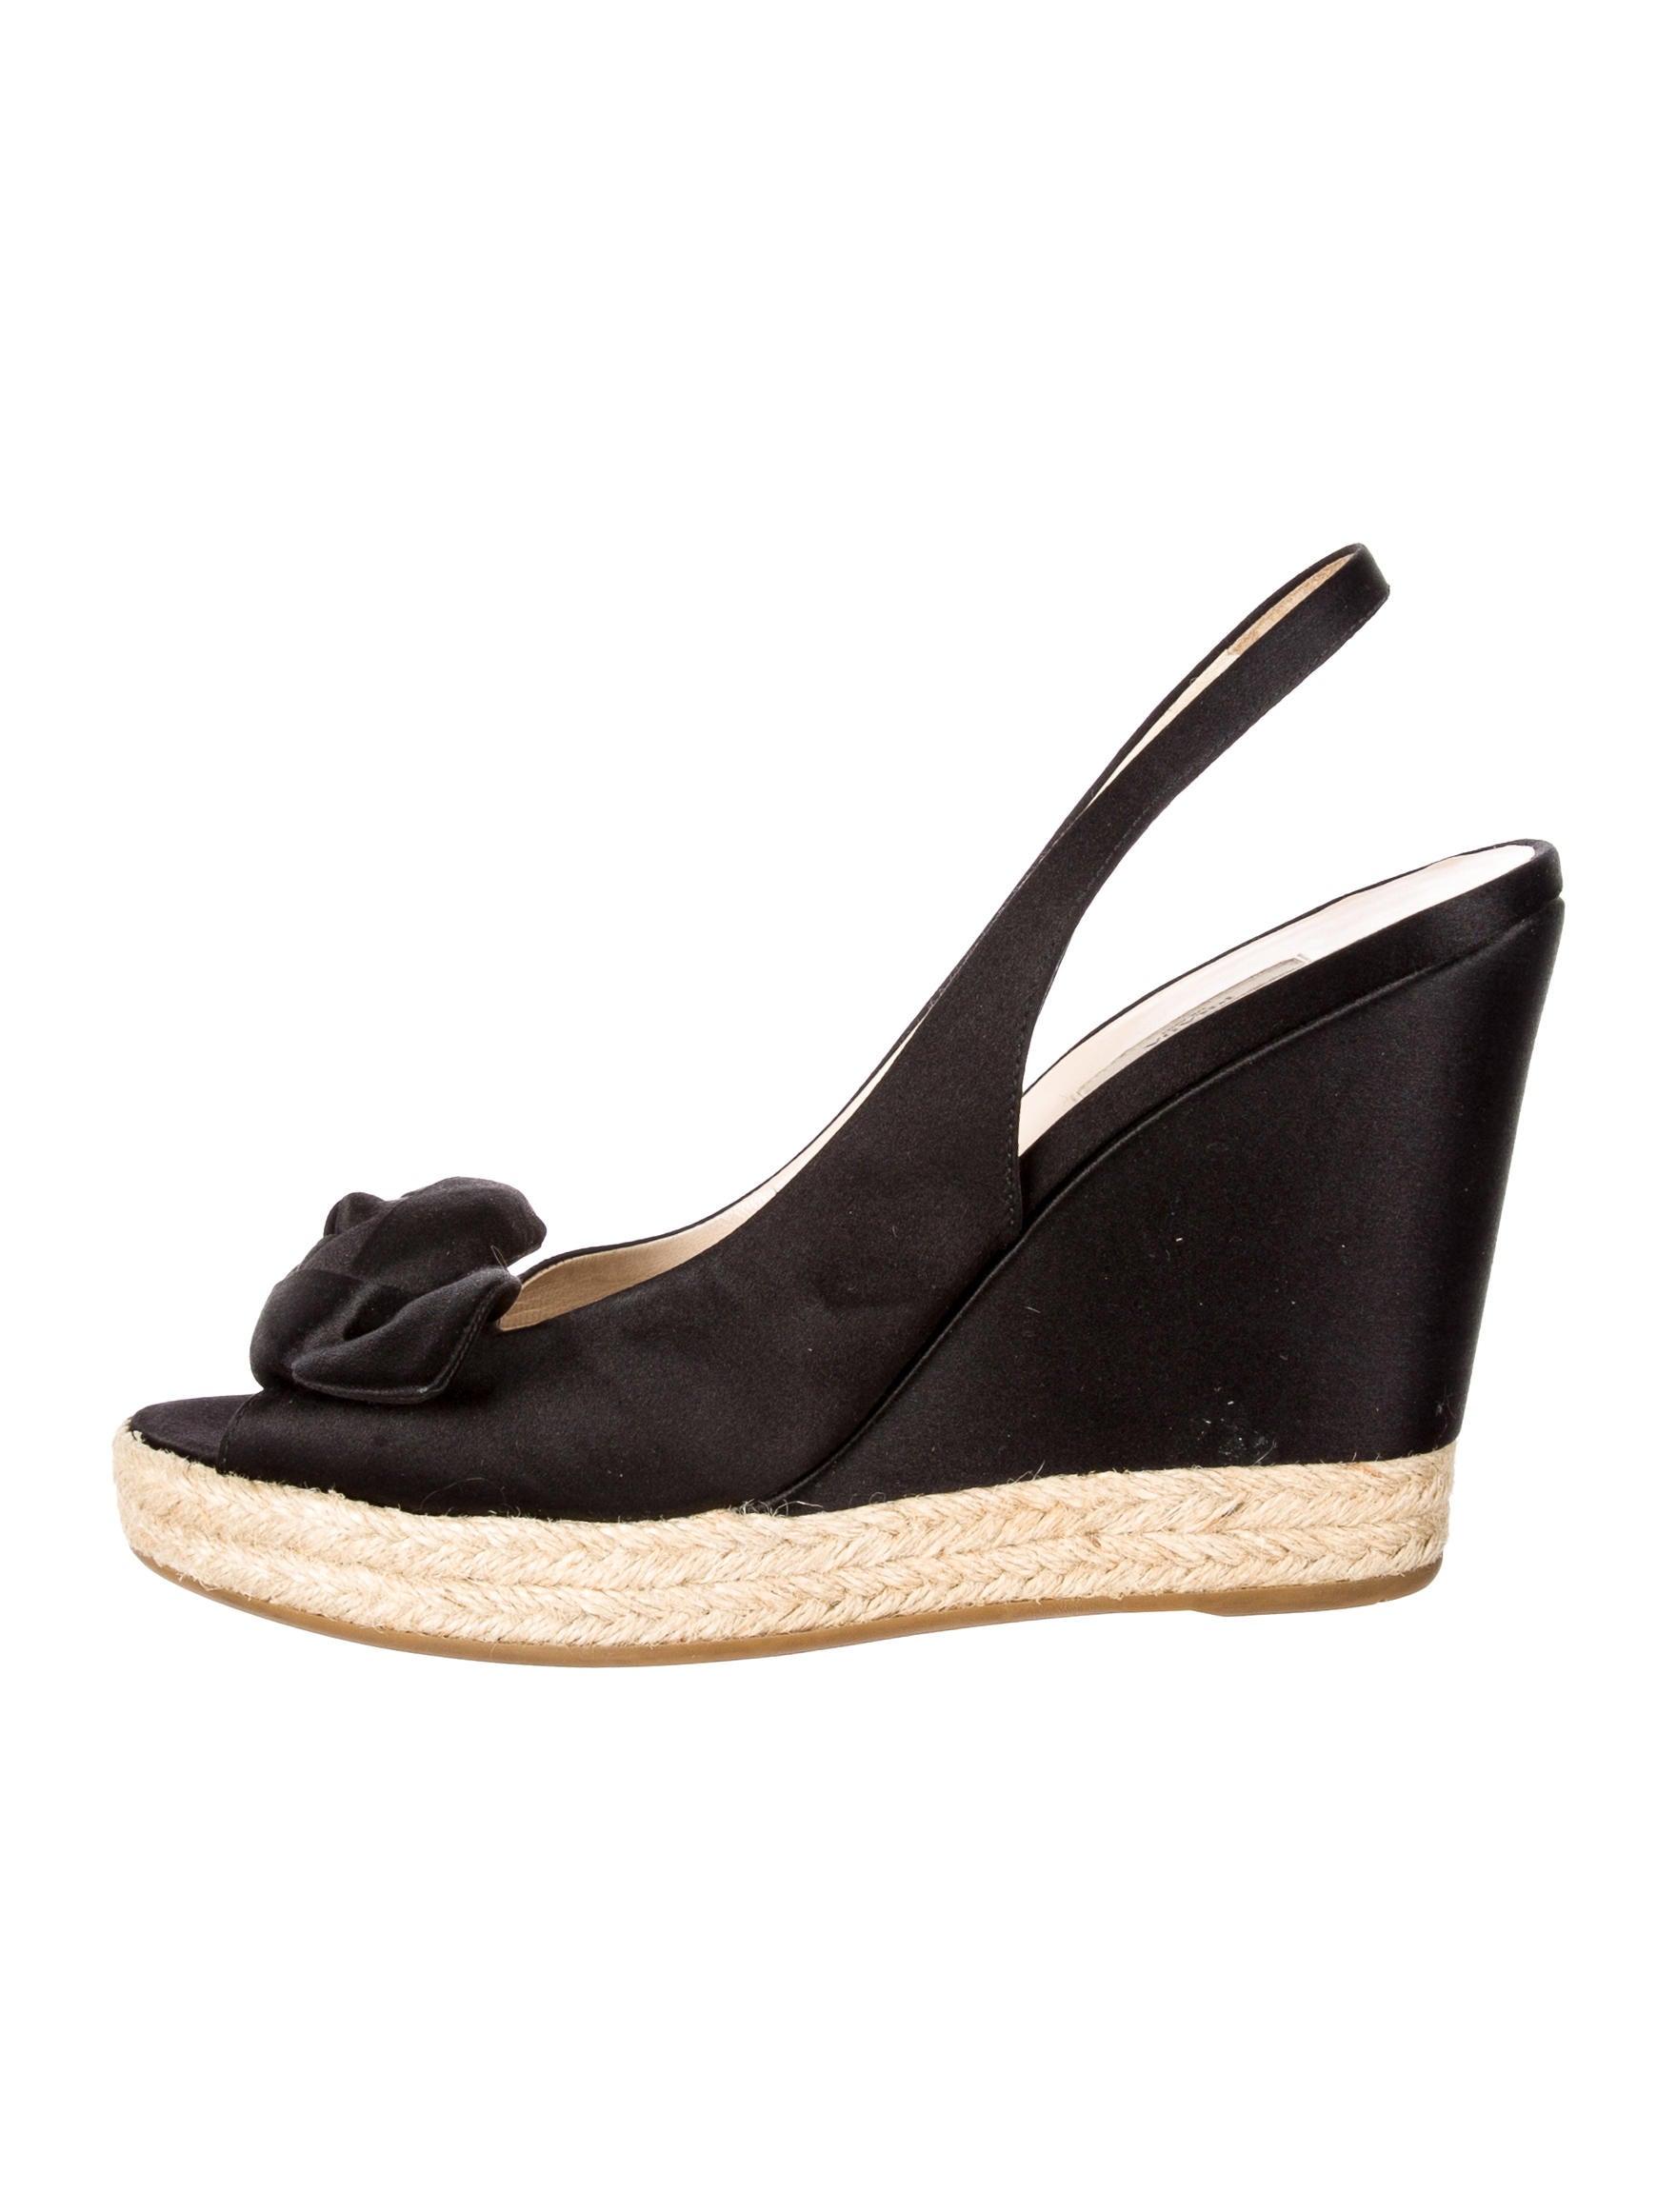 Innovative Prada Suede Sandals  Shoes  PRA82128  The RealReal